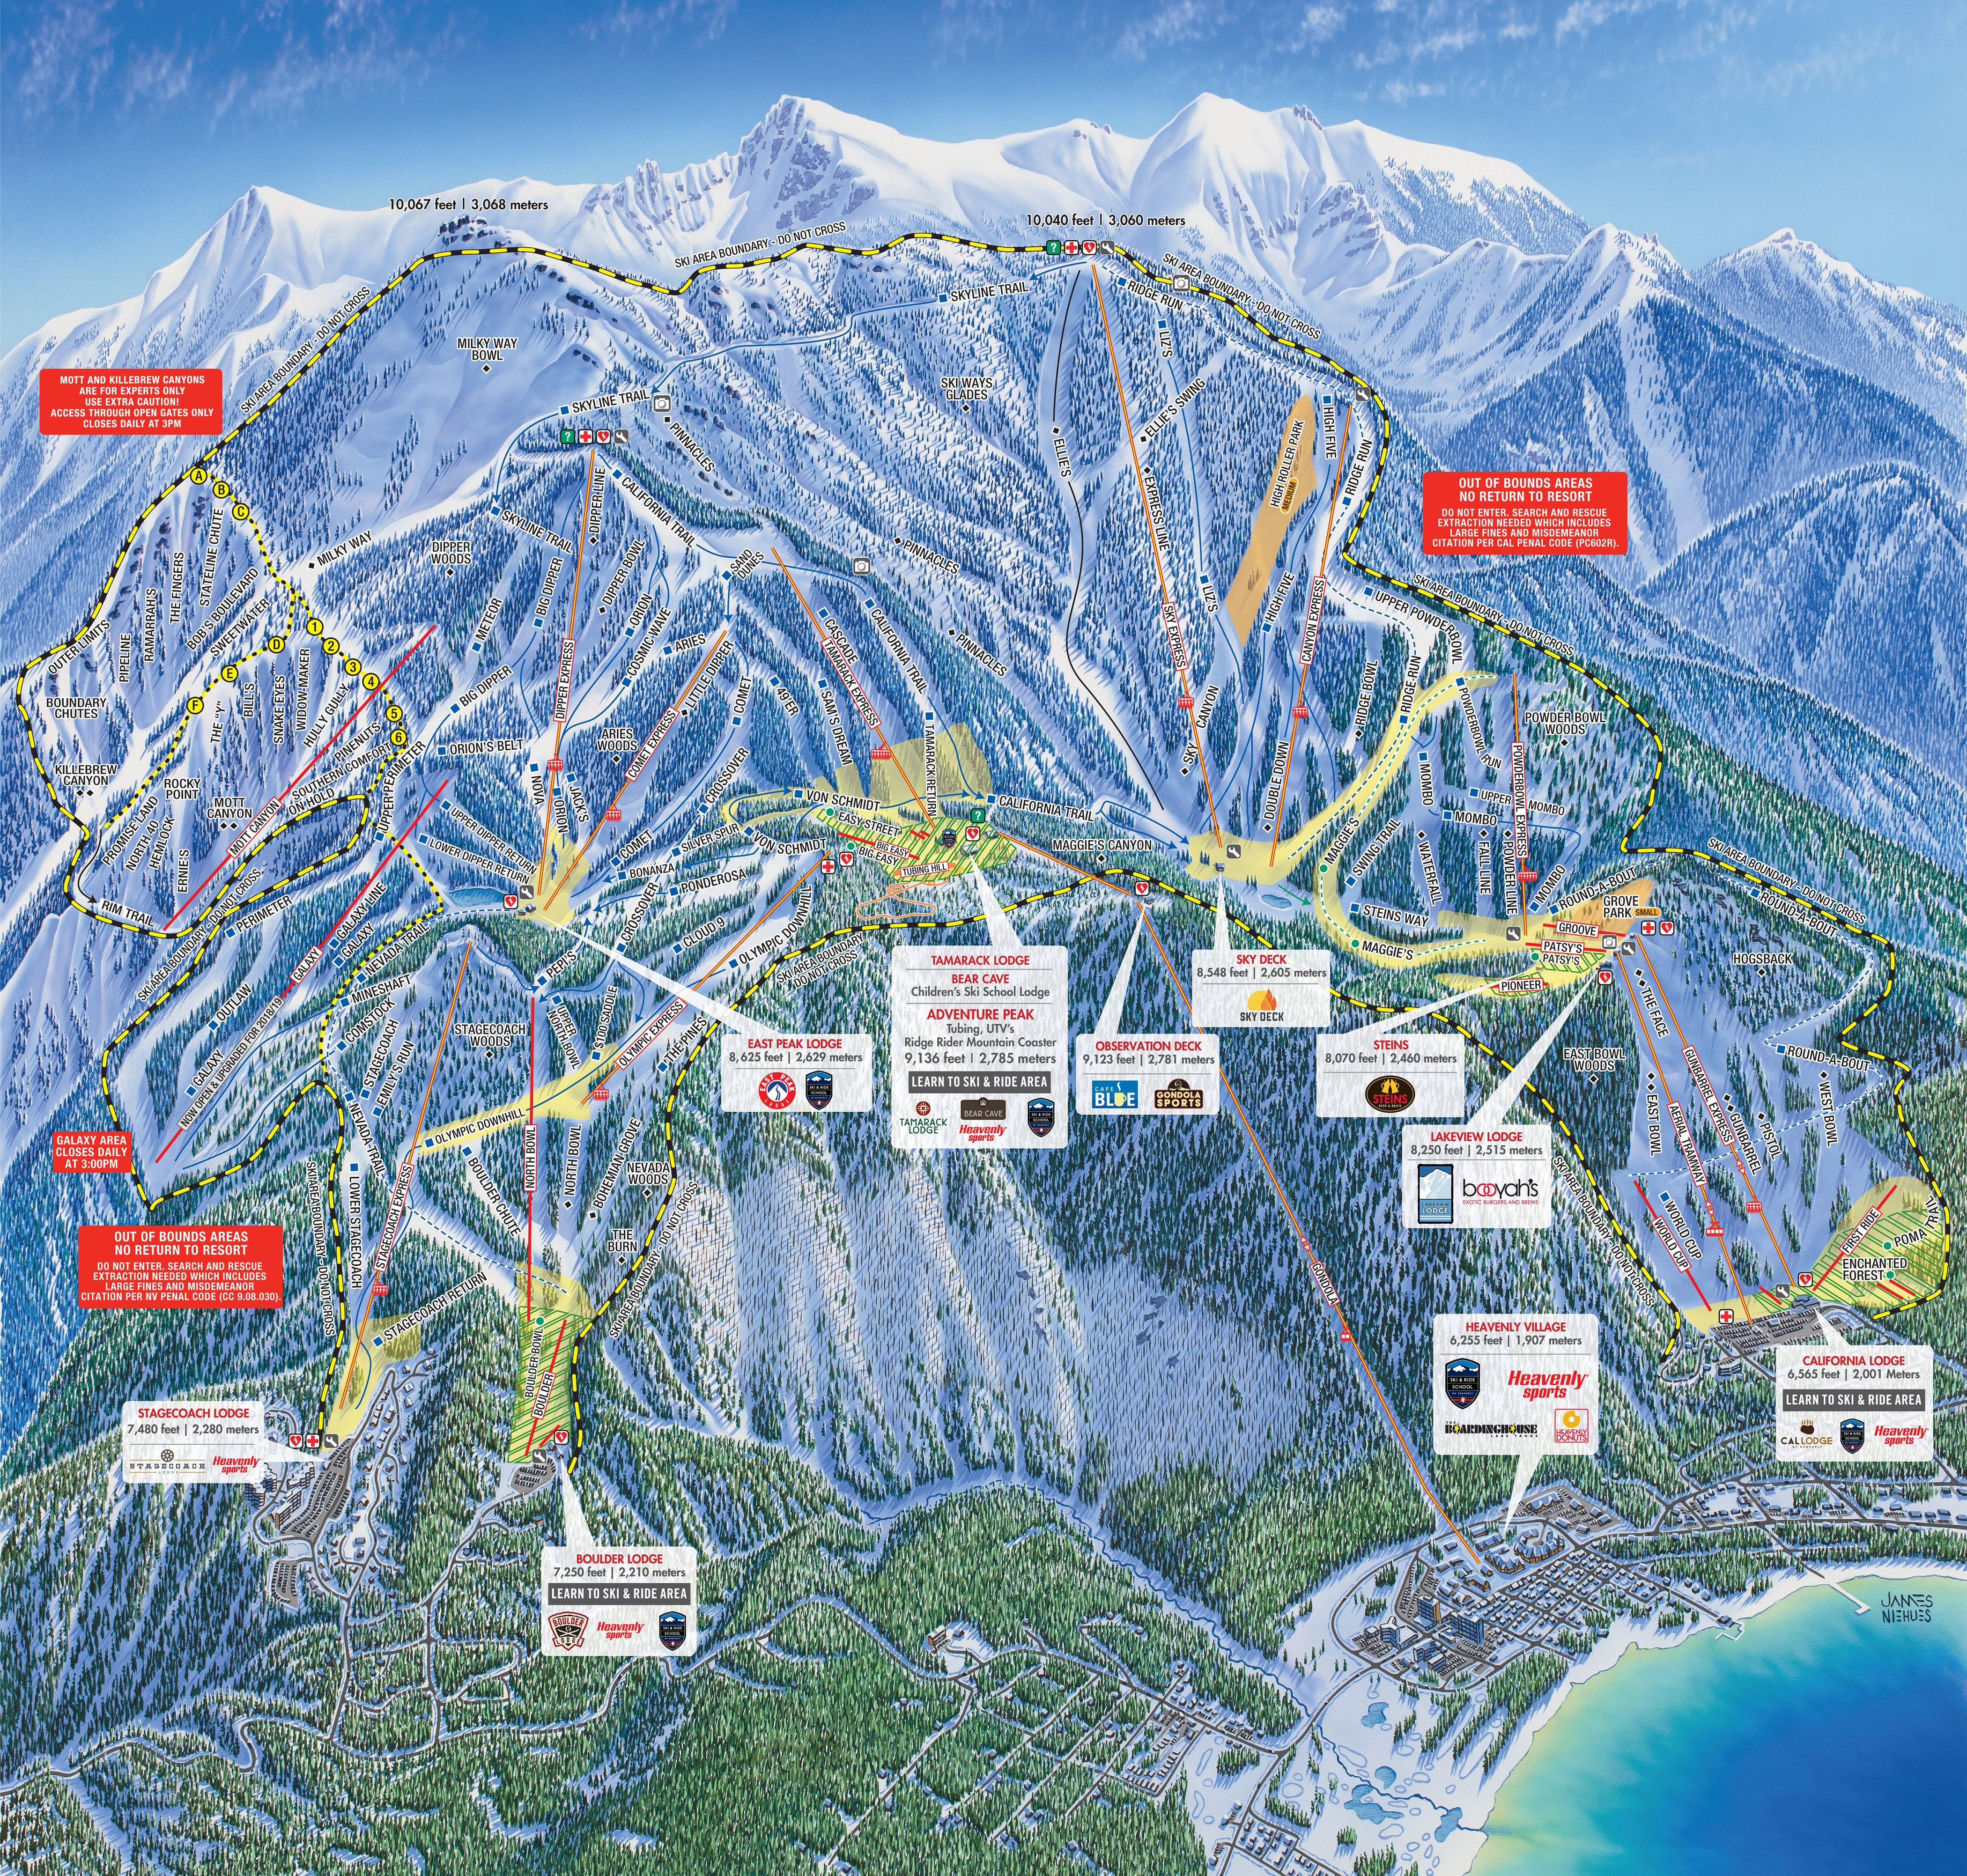 Trail Maps | Heavenly Ski Resort on new mexico ski areas map, idaho ski areas map, summit county ski areas map, colorado ski areas map, west virginia ski areas map, maine ski areas map, aspen ski areas map, wyoming ski areas map, vermont ski areas map, north carolina ski areas map, washington ski areas map, california ski areas map, utah ski areas map, alaska ski areas map, denver ski areas map, new england ski areas map, michigan ski areas map, montana ski areas map, new hampshire ski areas map, massachusetts ski areas map,